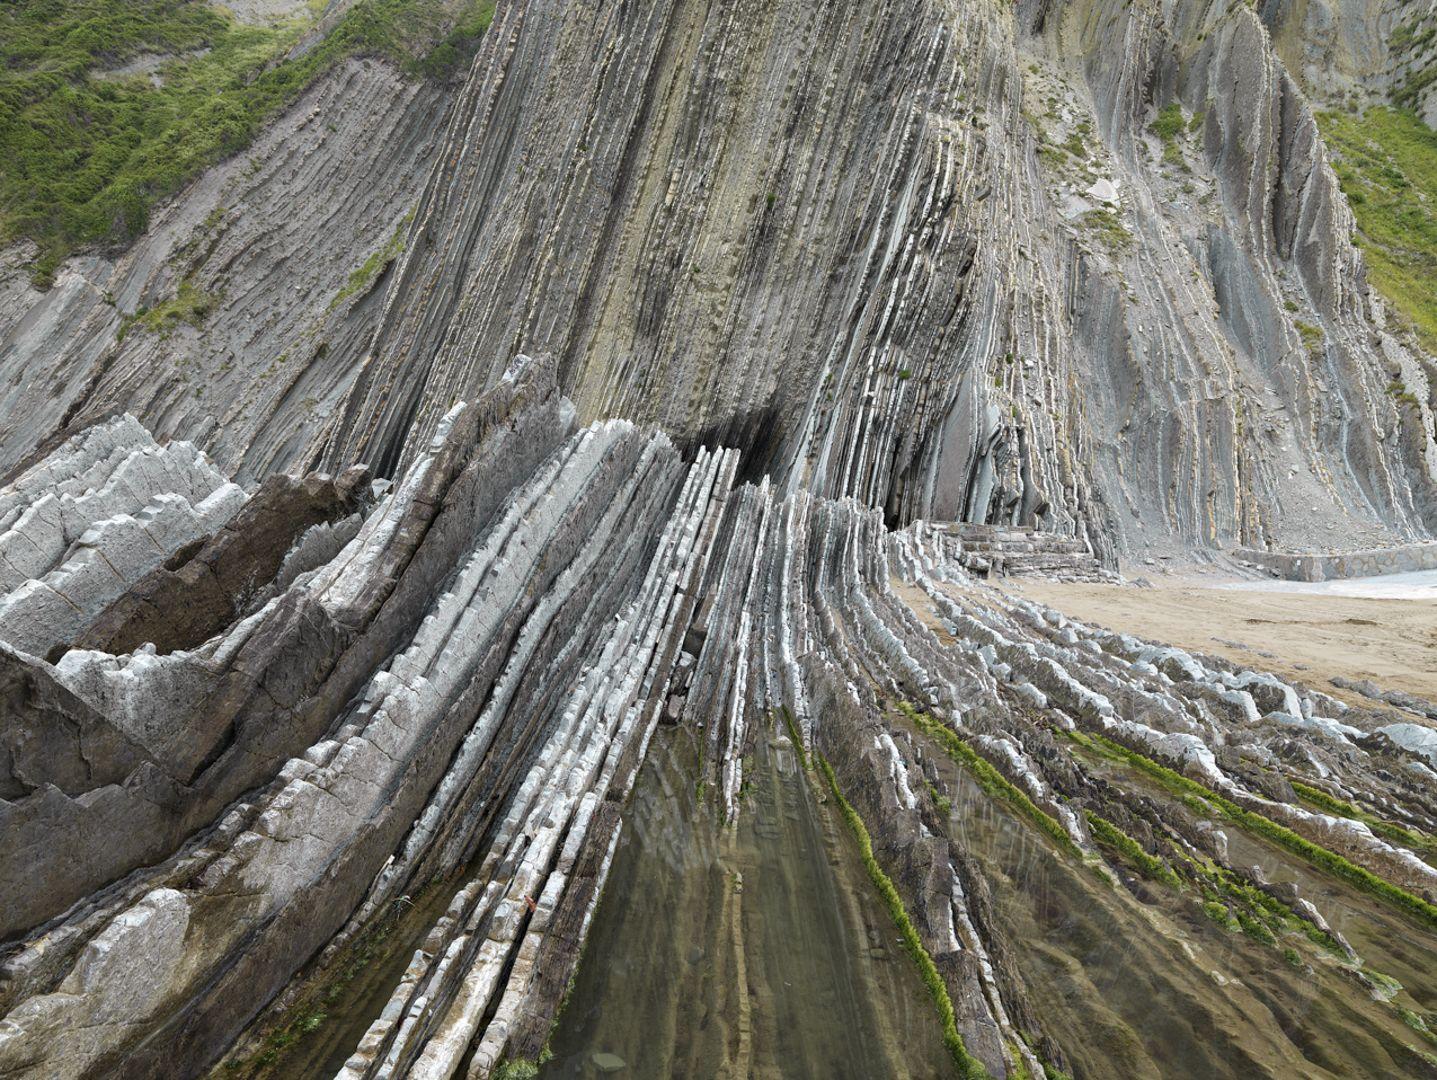 Edward Burtynsky - Basque Coast #1, UNESCO, Geopark, Zumaia, Spain 1/9, 2015 - Howard Greenberg Gallery - 2018